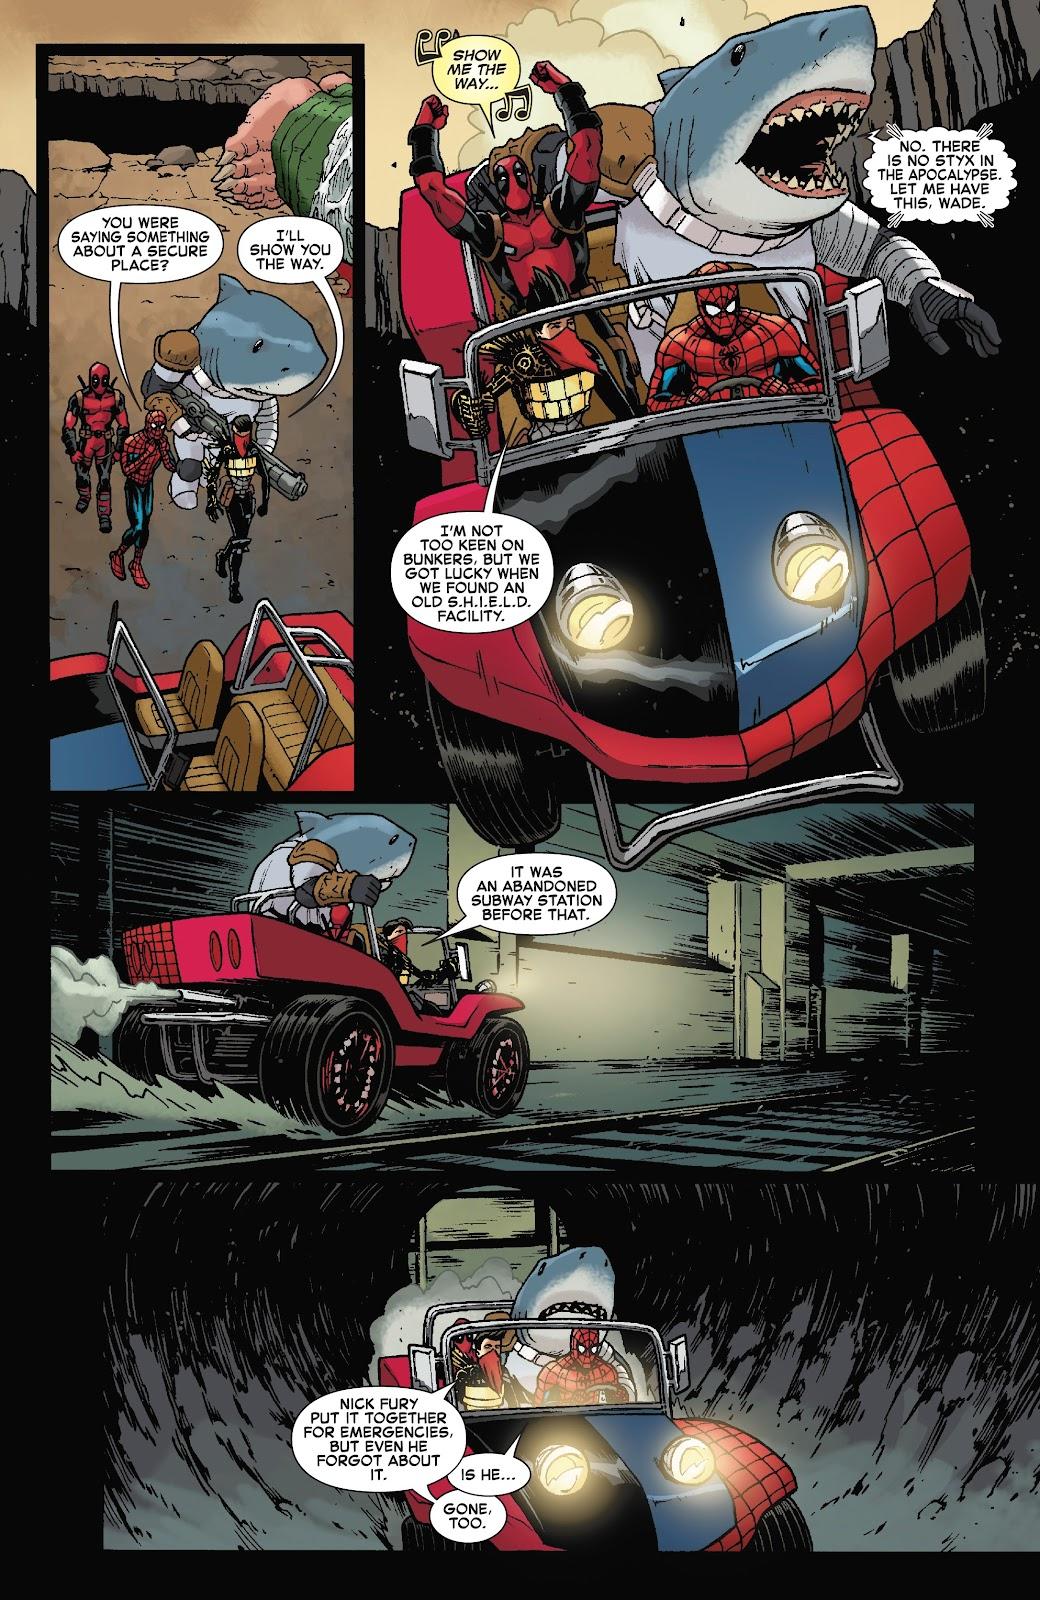 Read online Spider-Man/Deadpool comic -  Issue #46 - 20